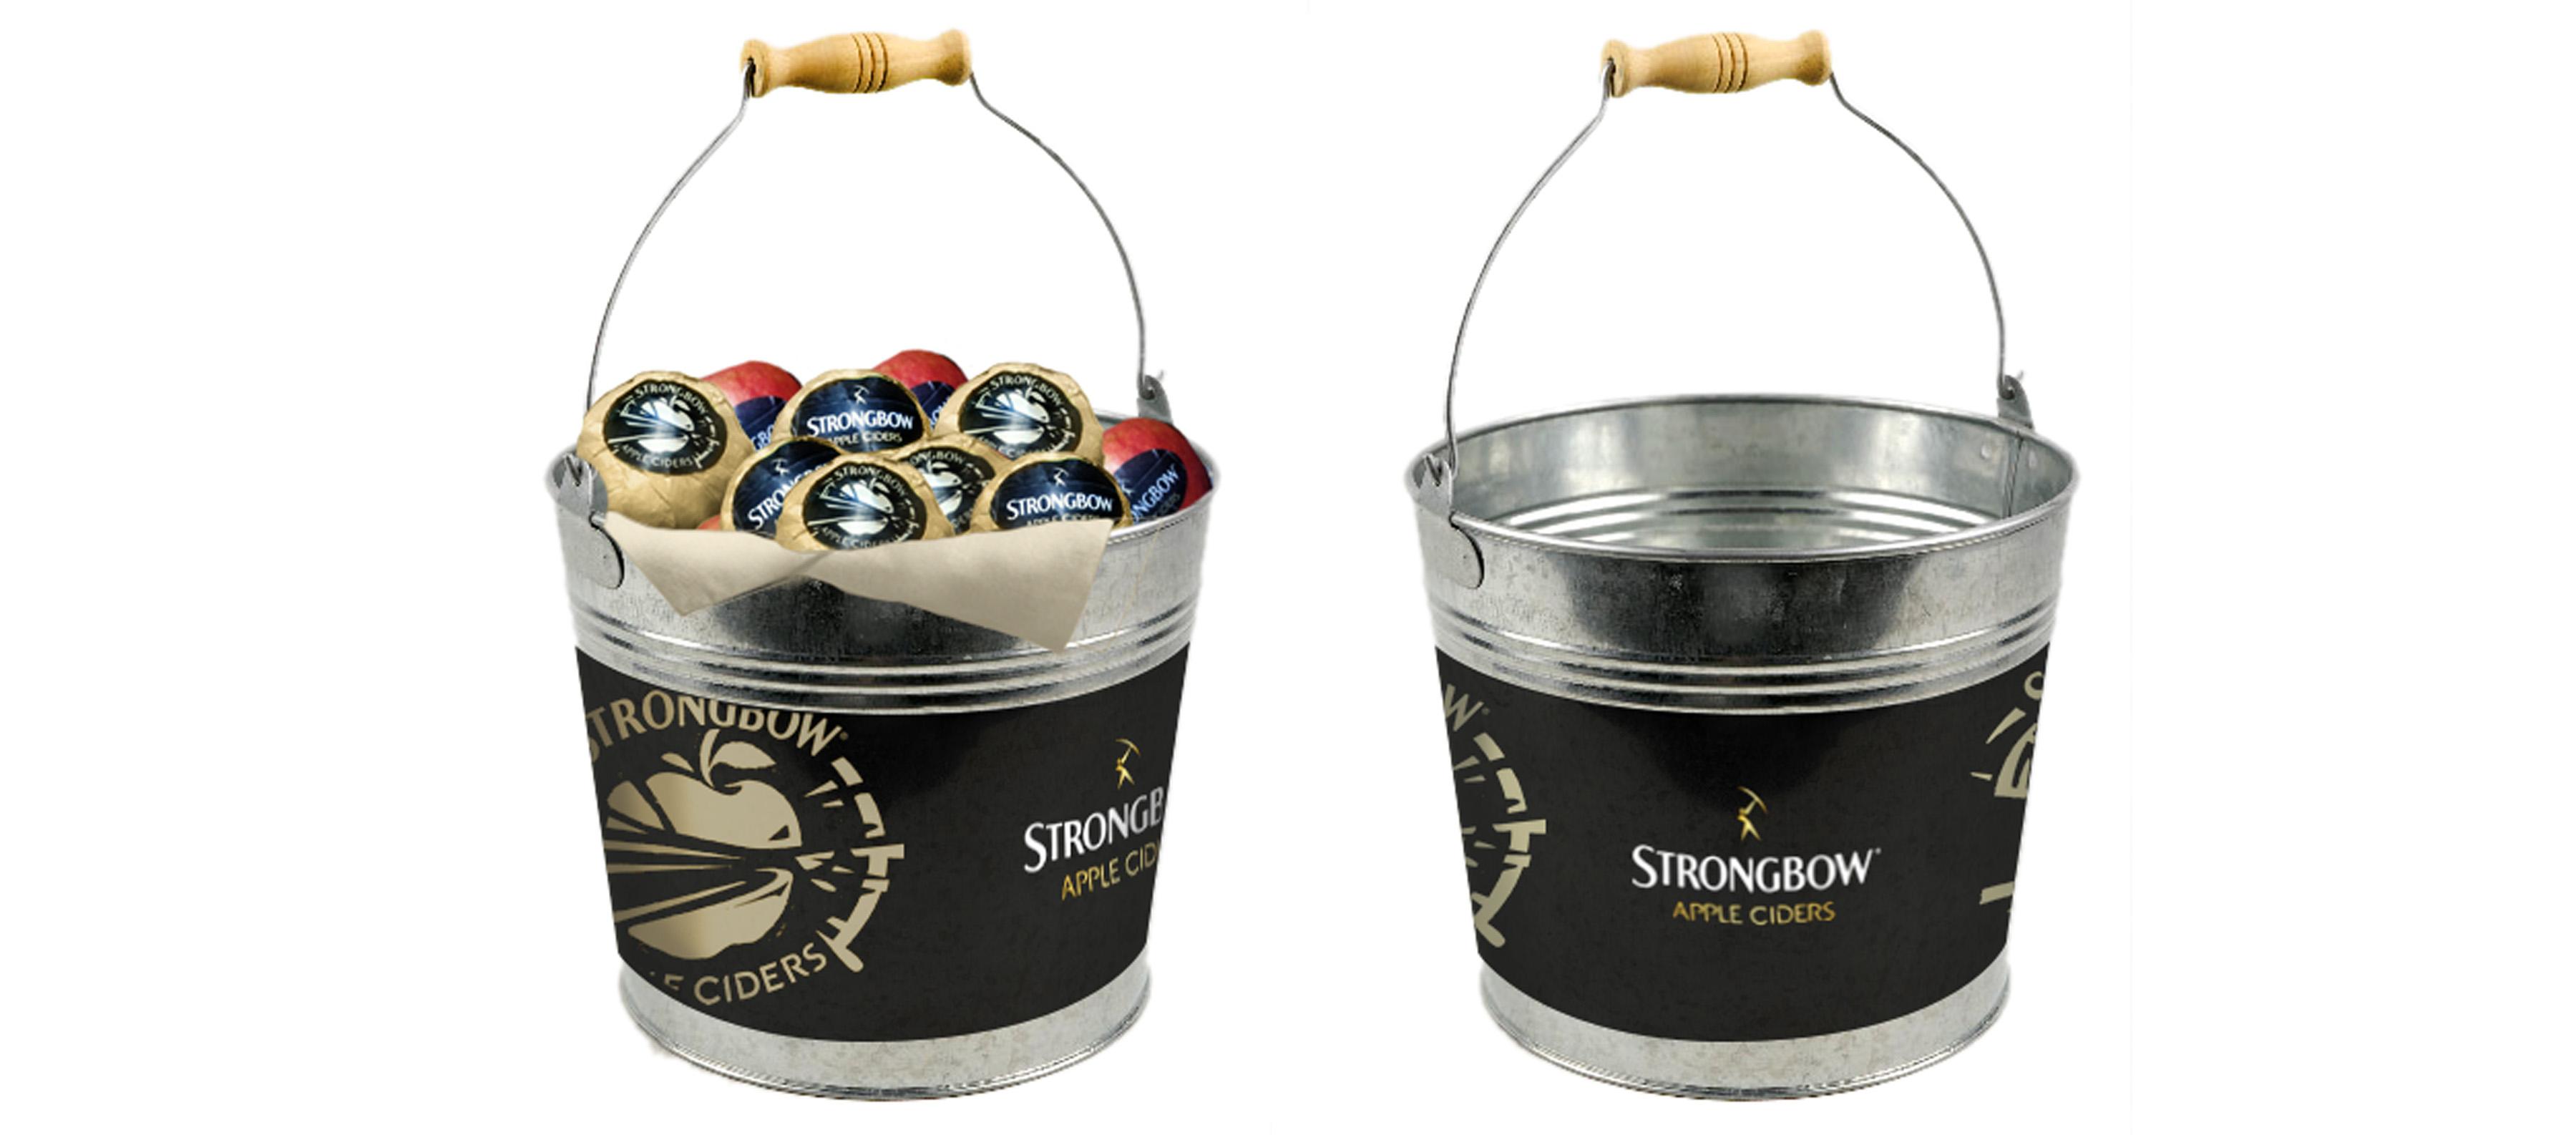 strongbow buckets better